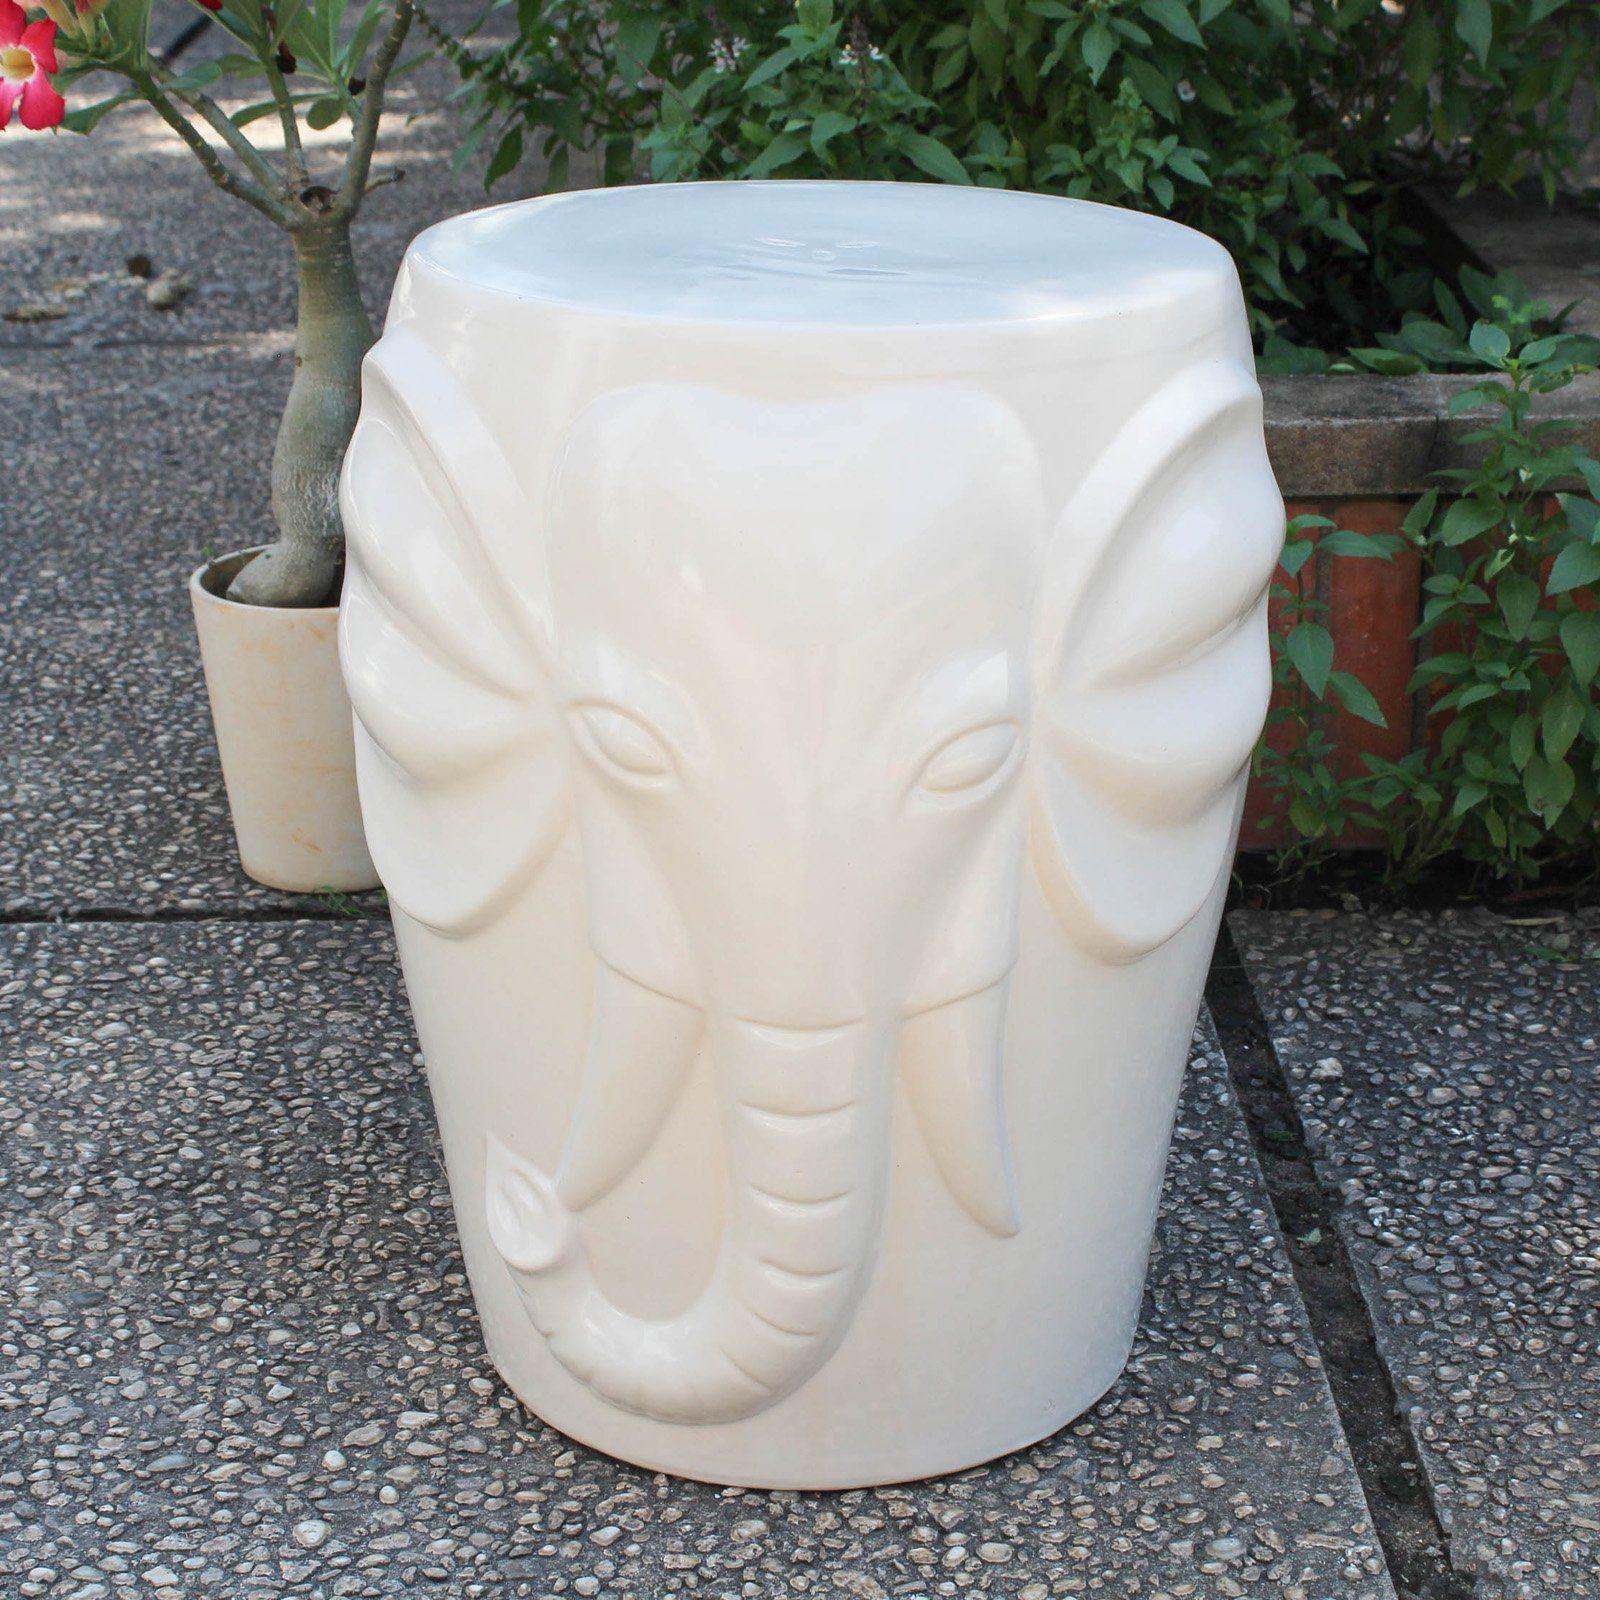 Outdoor International Caravan Catalina Wild Elephant 640 x 480